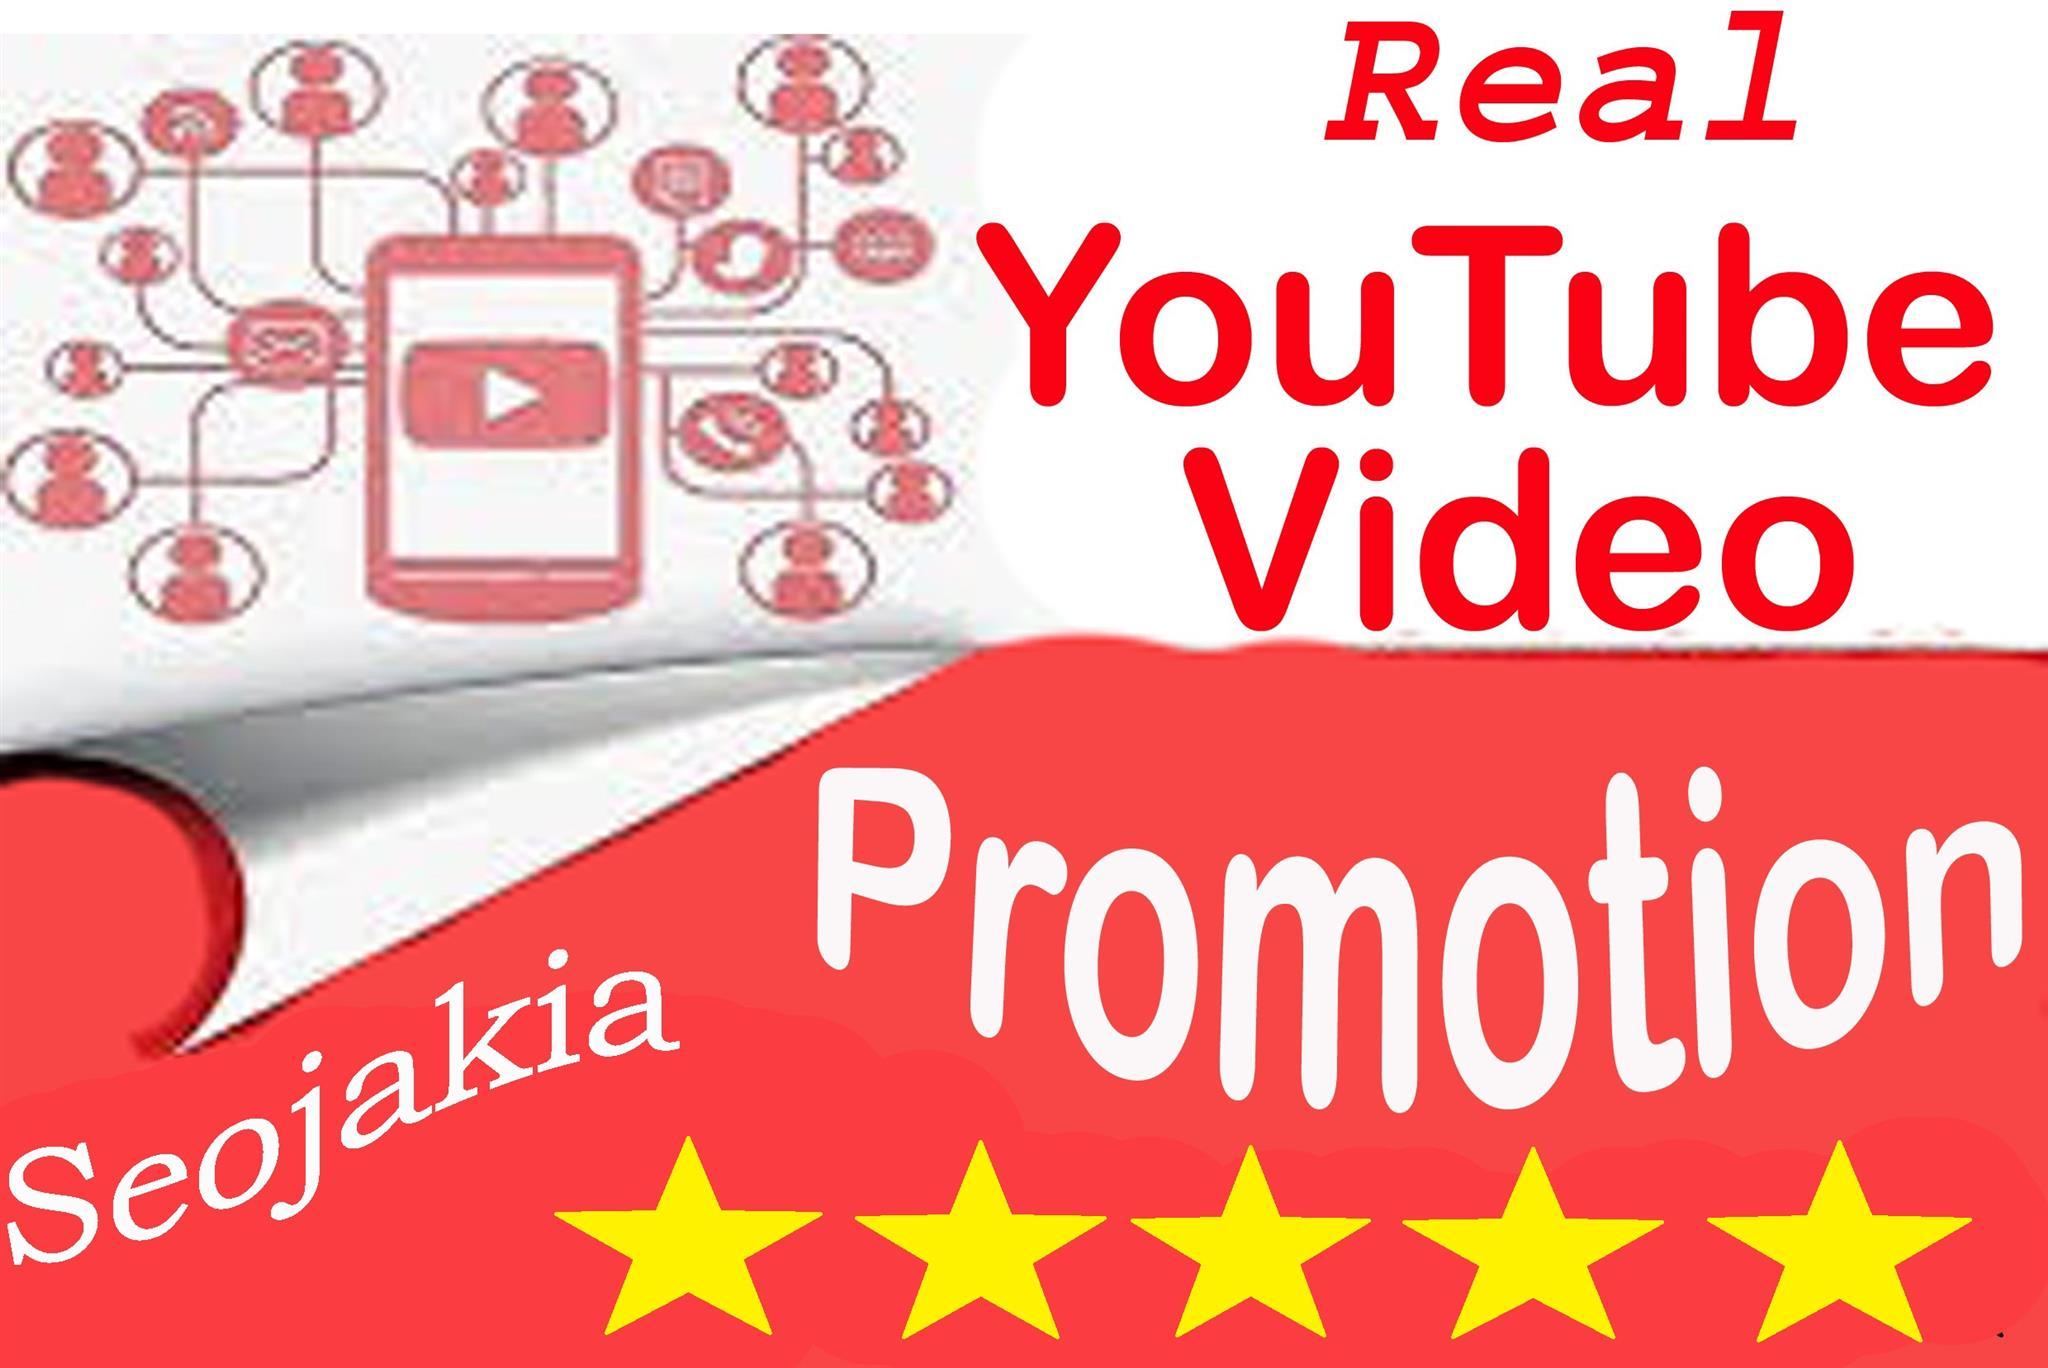 Youtube-Marketing-Safe-Video-Promotion-Real-Via-User